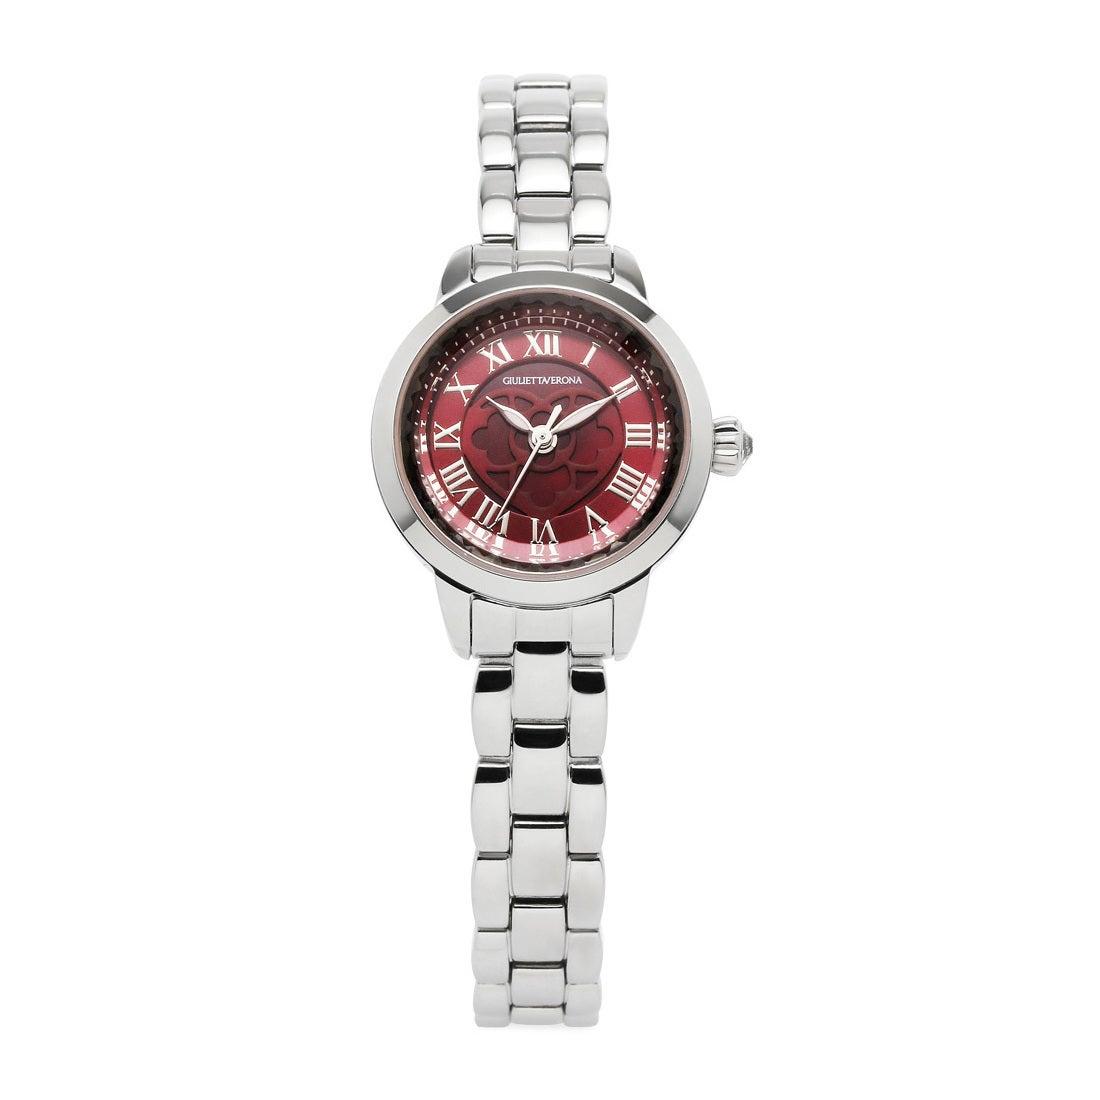 【SAC'S BAR】ジュリエッタヴェローナ GIULIETTAVERONA 腕時計 GV003S LOVE VERONA ピンク×レッド